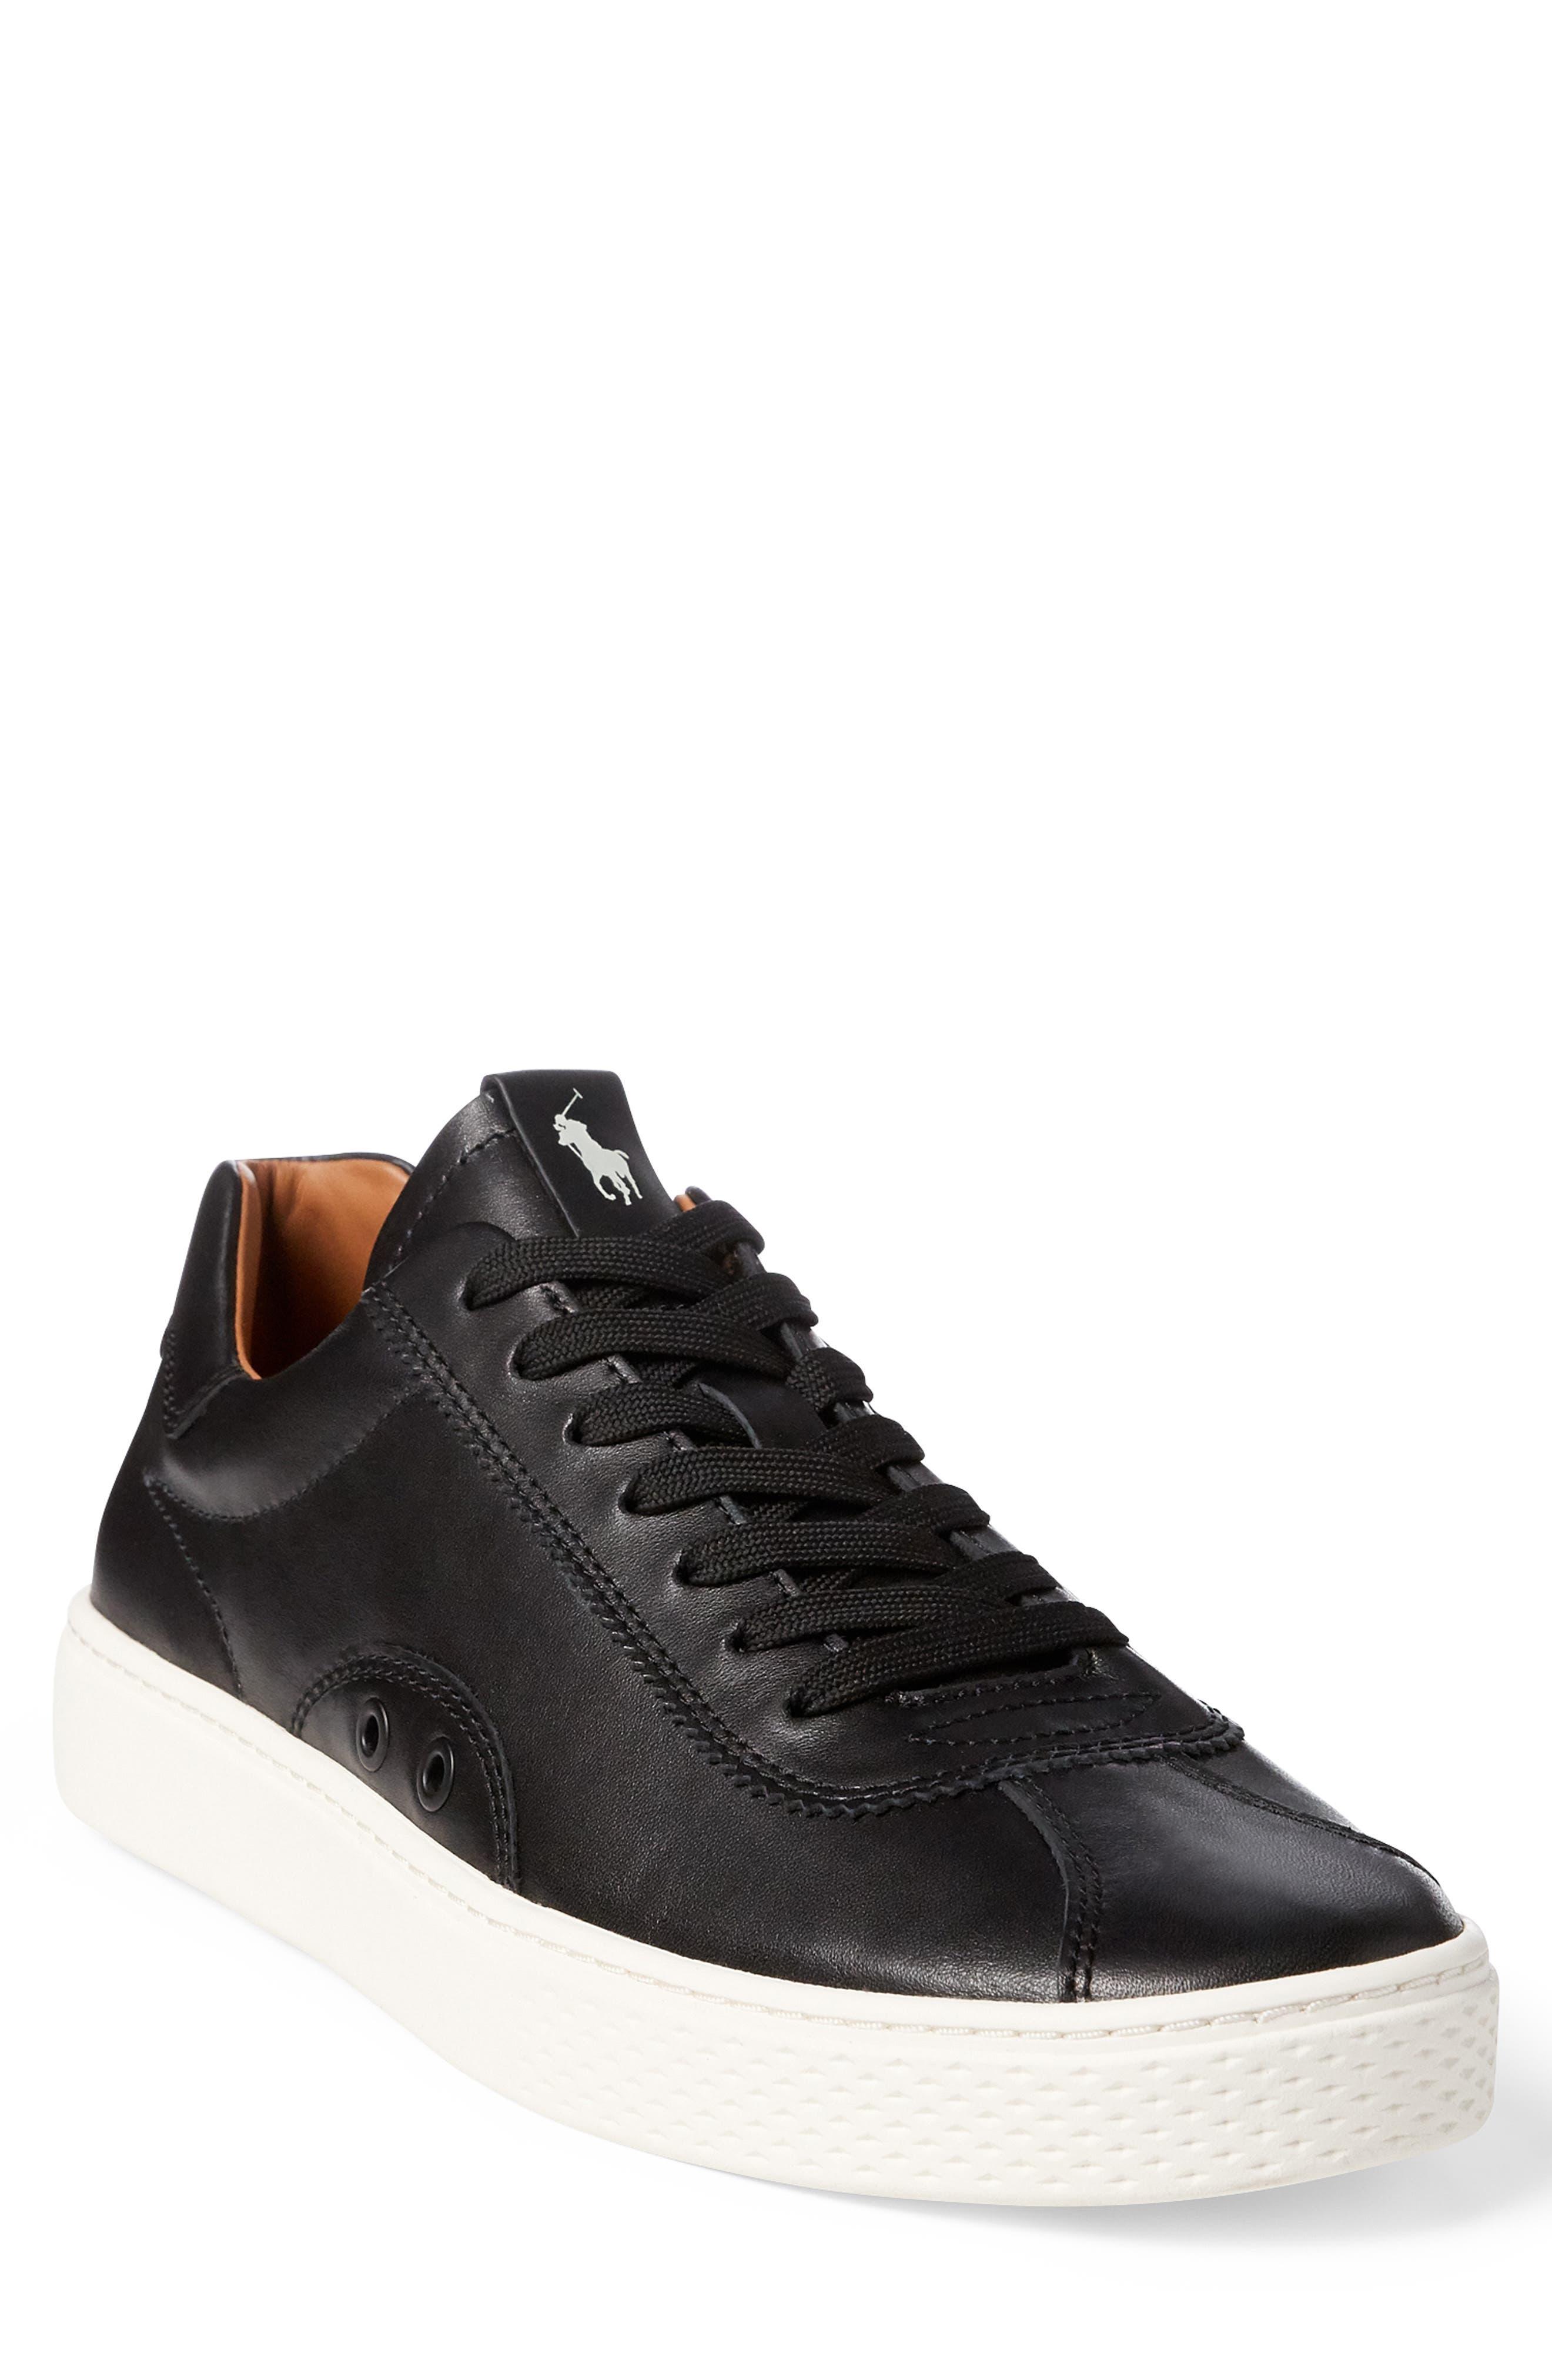 Polo Ralph Lauren Court 100 Lux Sneaker, Black